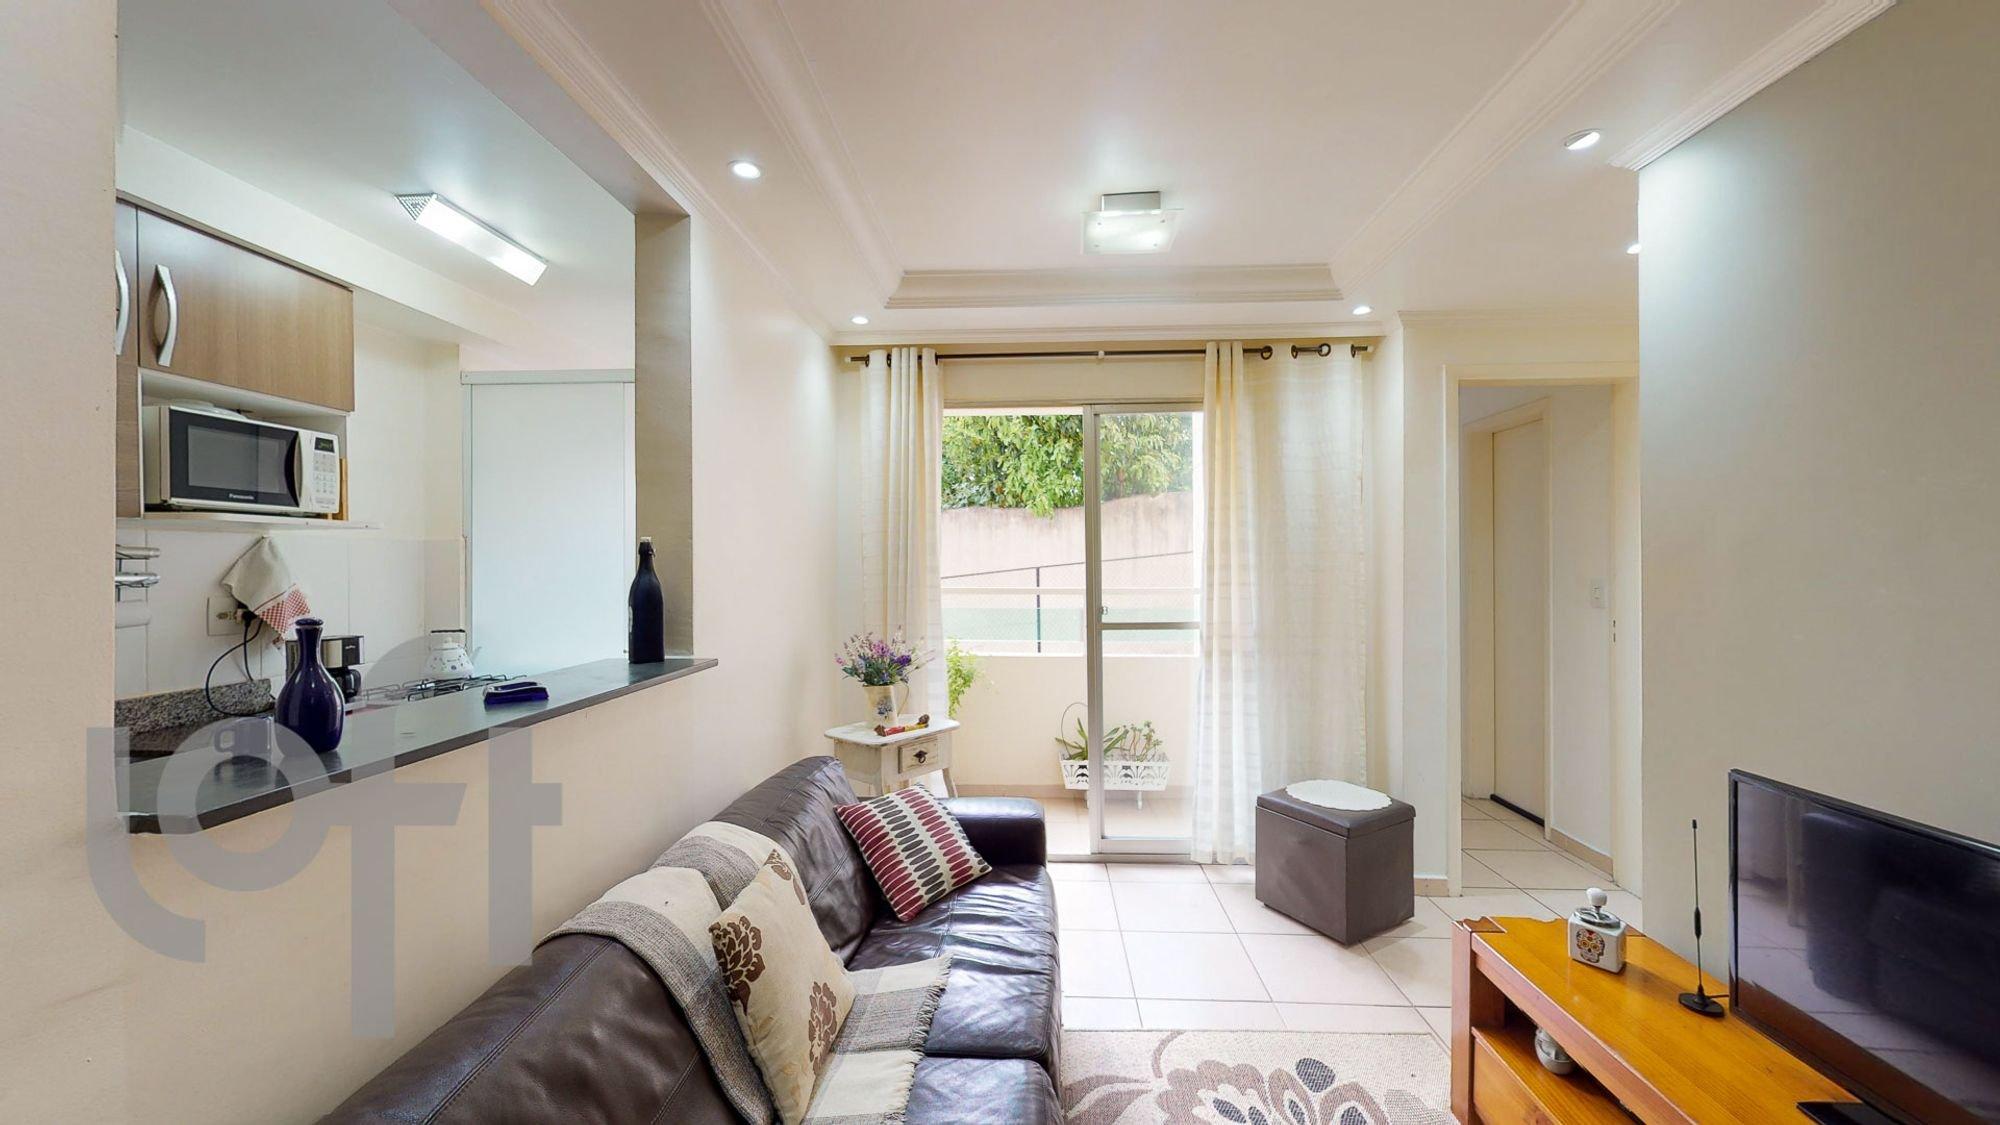 Foto de Sala com vaso de planta, sofá, televisão, vaso, microondas